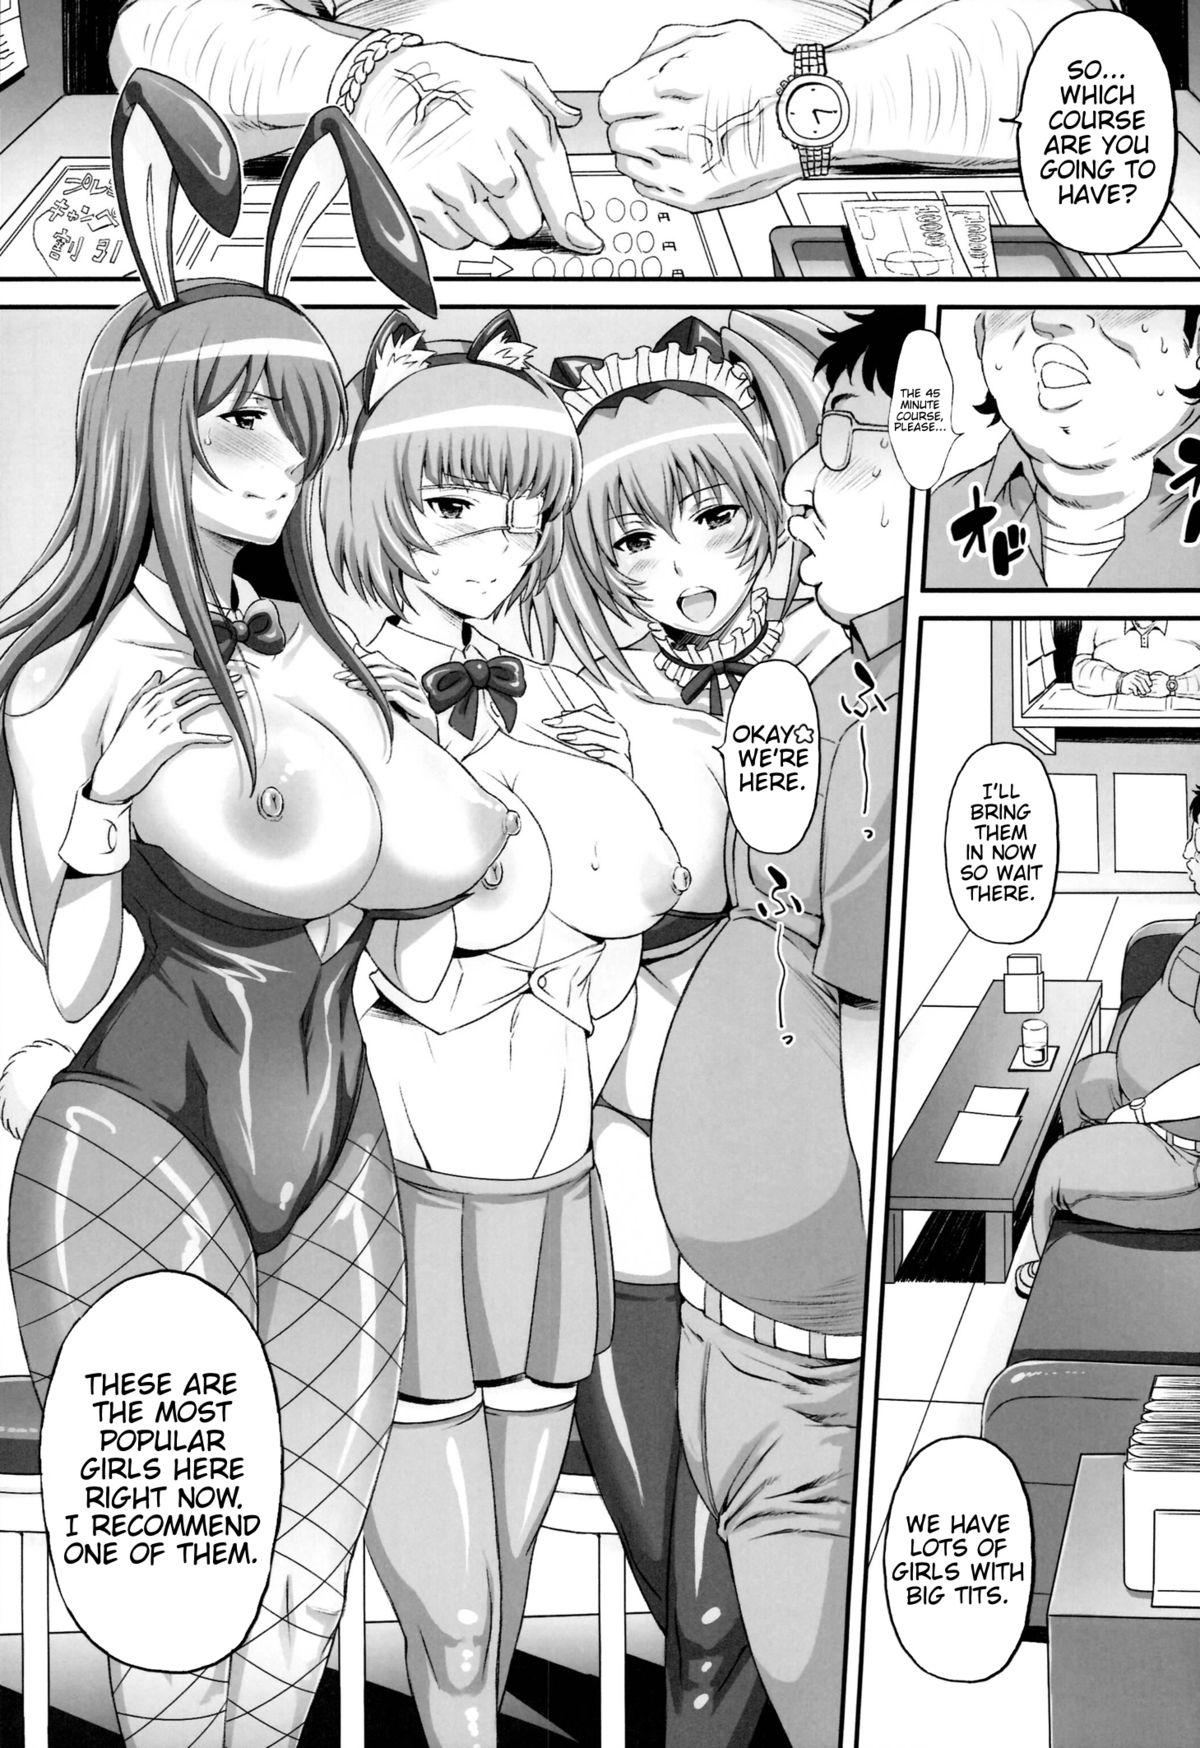 (C86) [Diogenes Club (Haikawa Hemlen)] Shokukan Mankan Zenseki Go Touki Ryoujoku   Shokukan Mankan Zenseki 5 - Princess Rape Battle- Cosplay Kanu (Ikkitousen) [English] {doujin-moe.us} 3